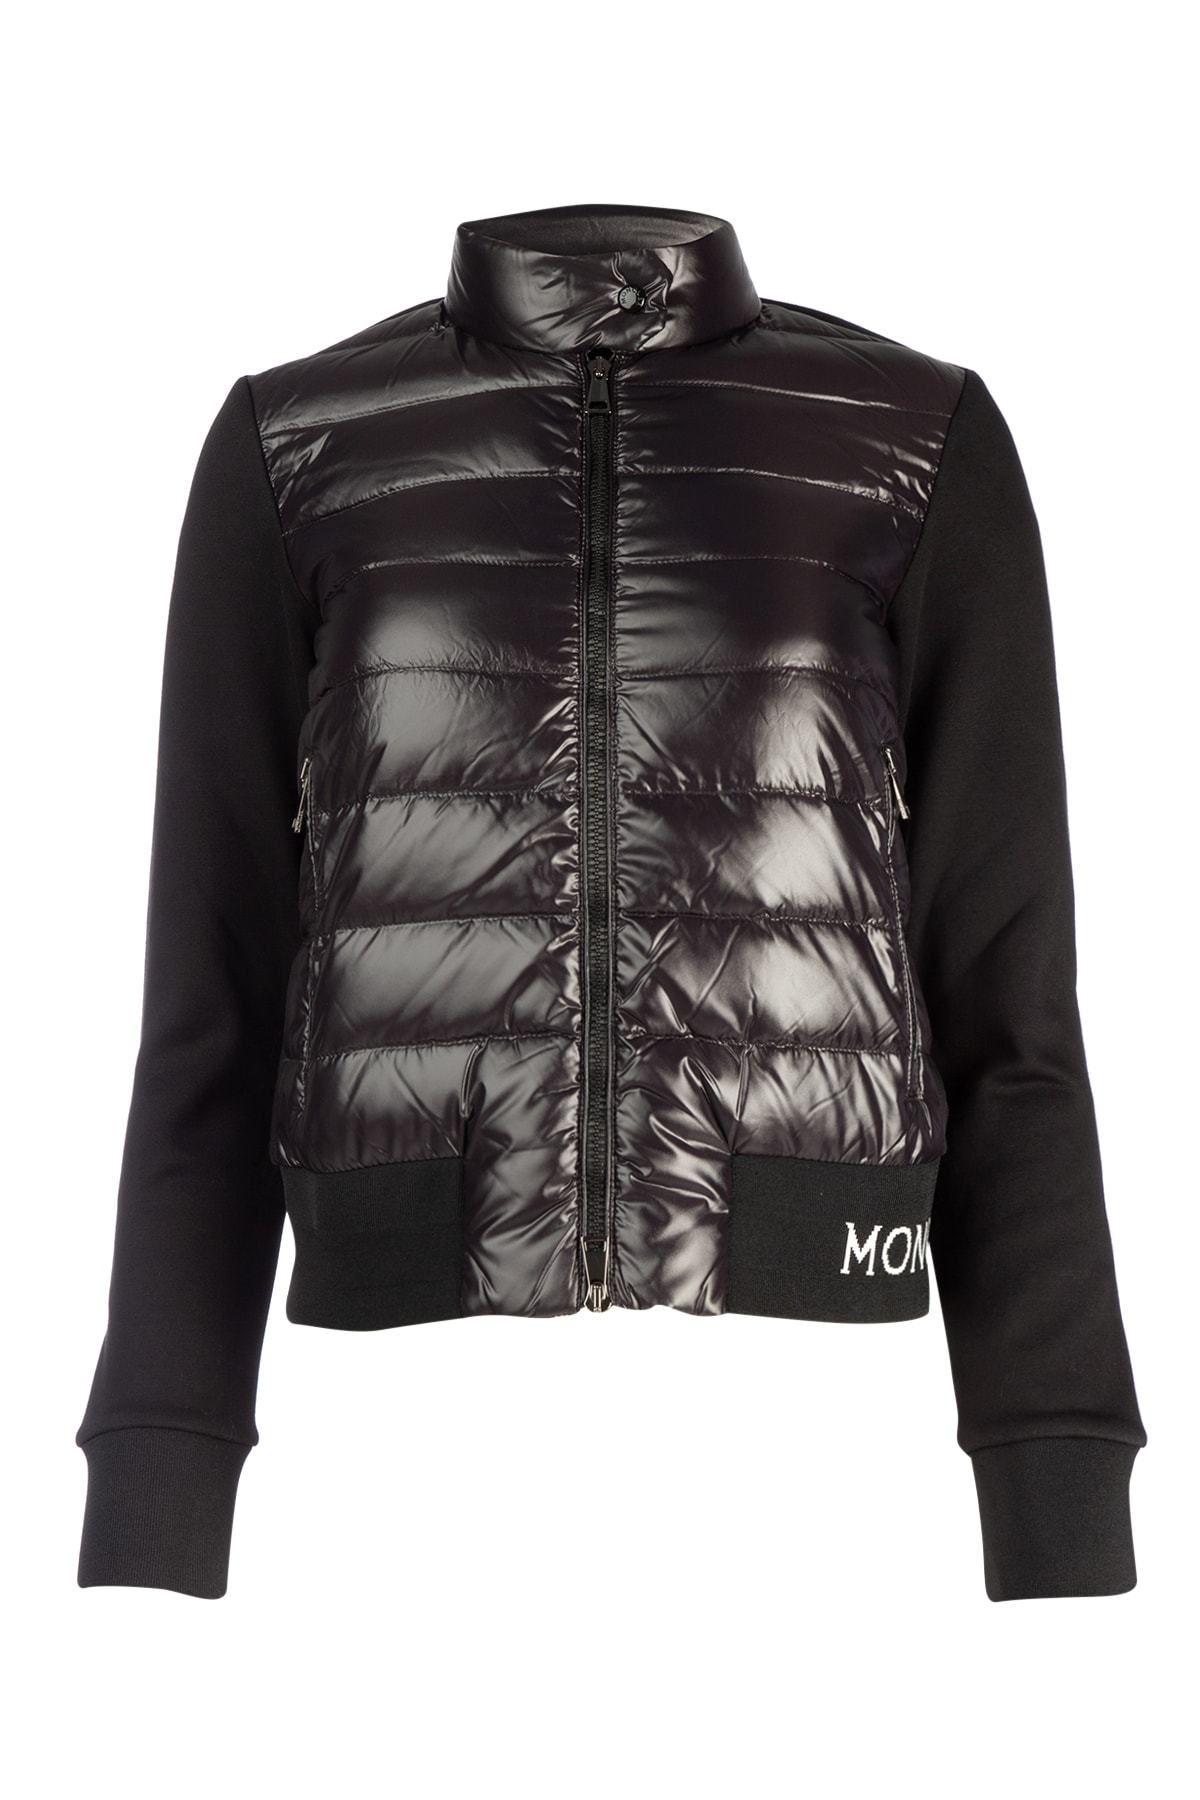 Moncler Techno Down & Cotton Blend Knit Jacket In Black